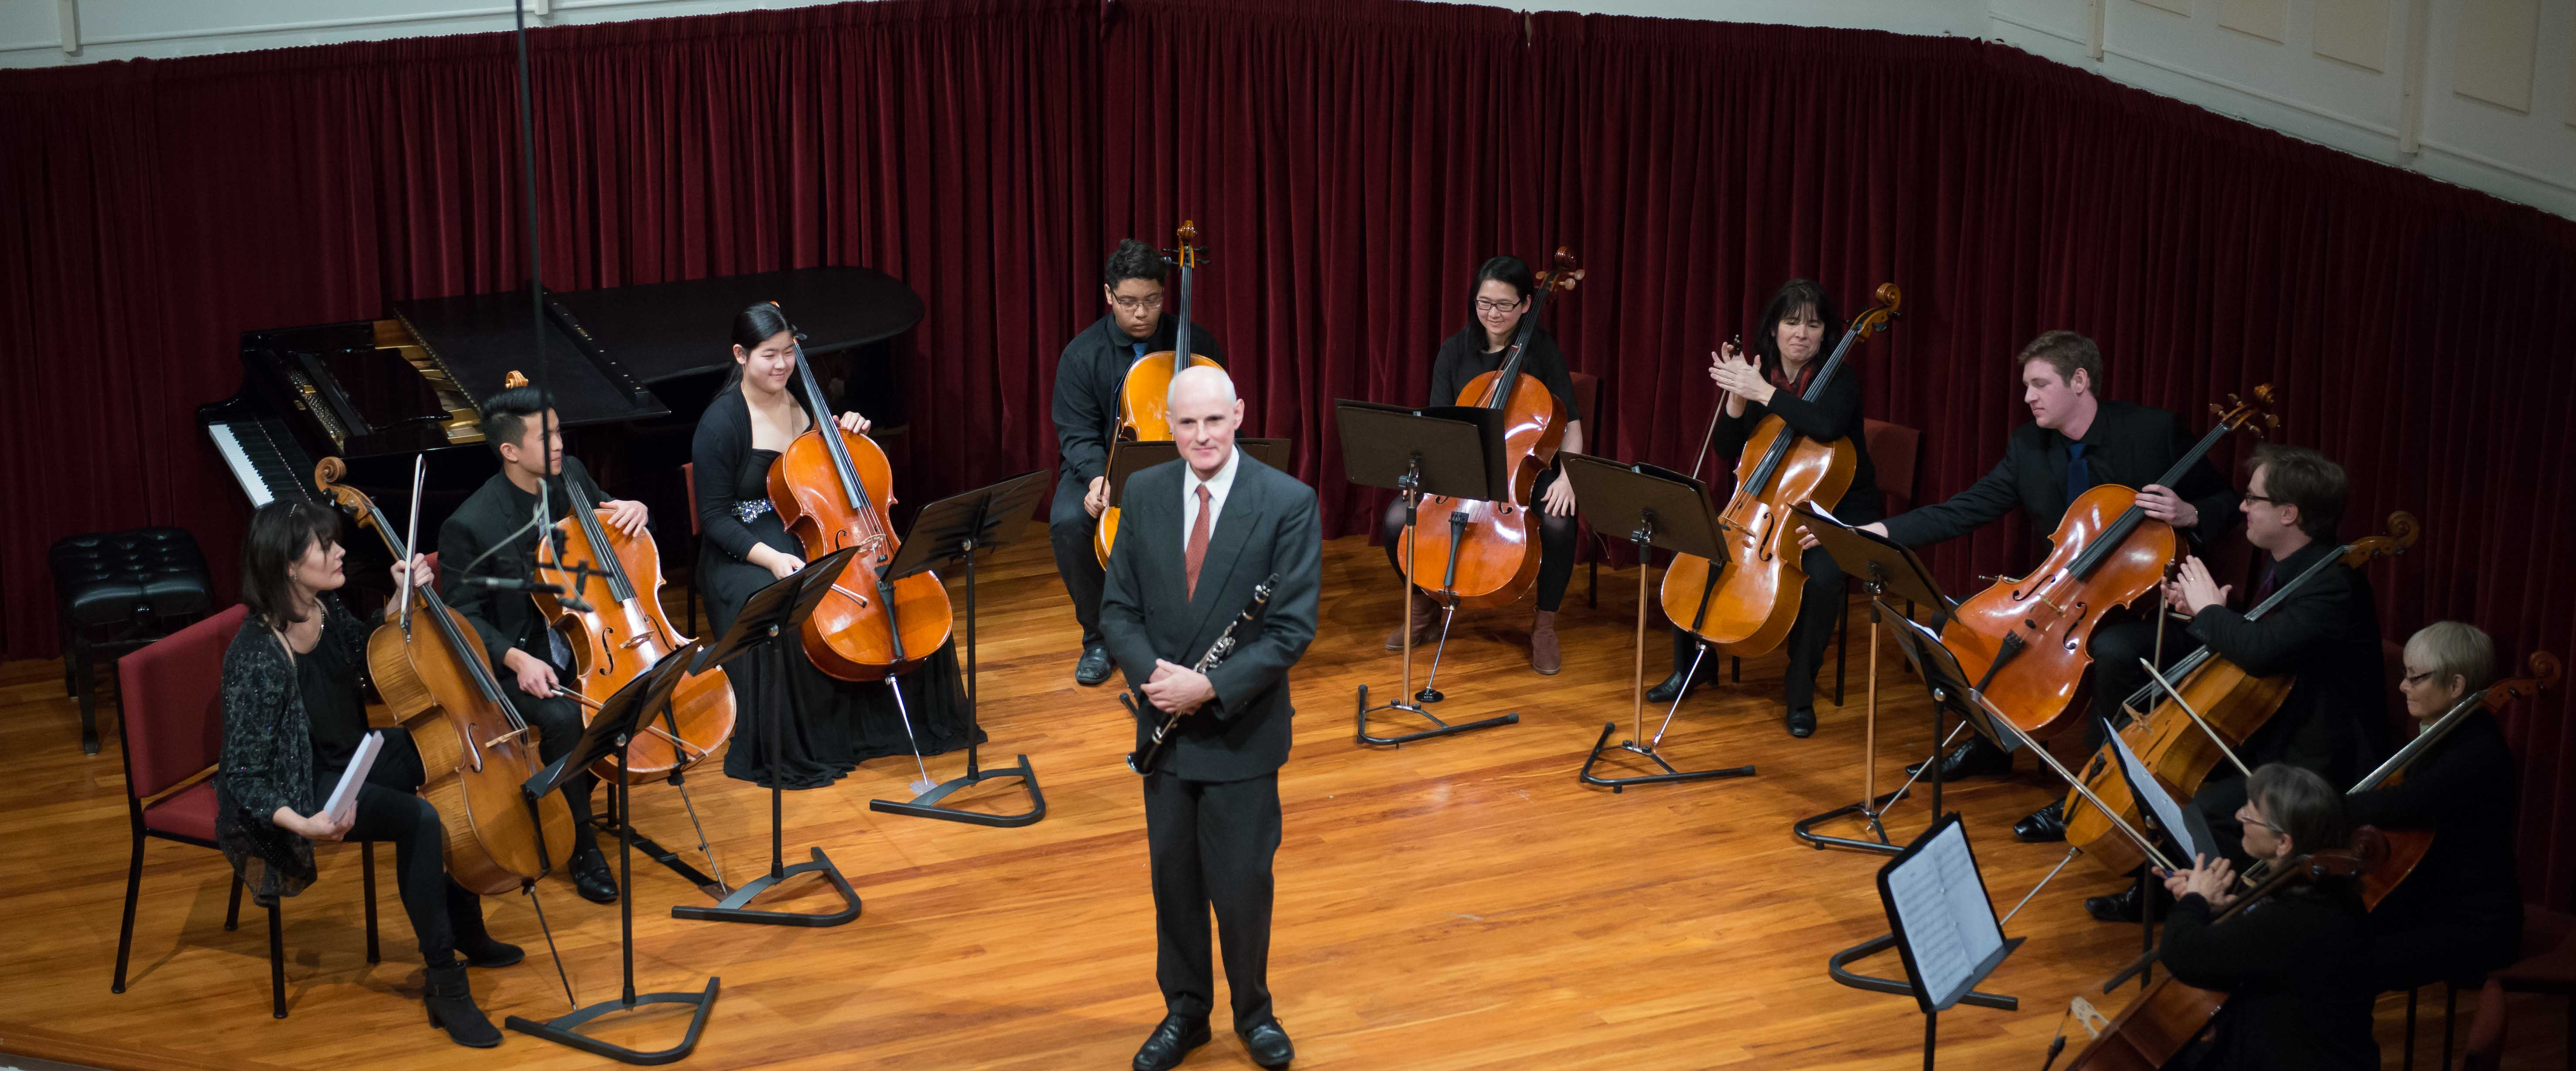 Cellists of Otago Marama 2016-2